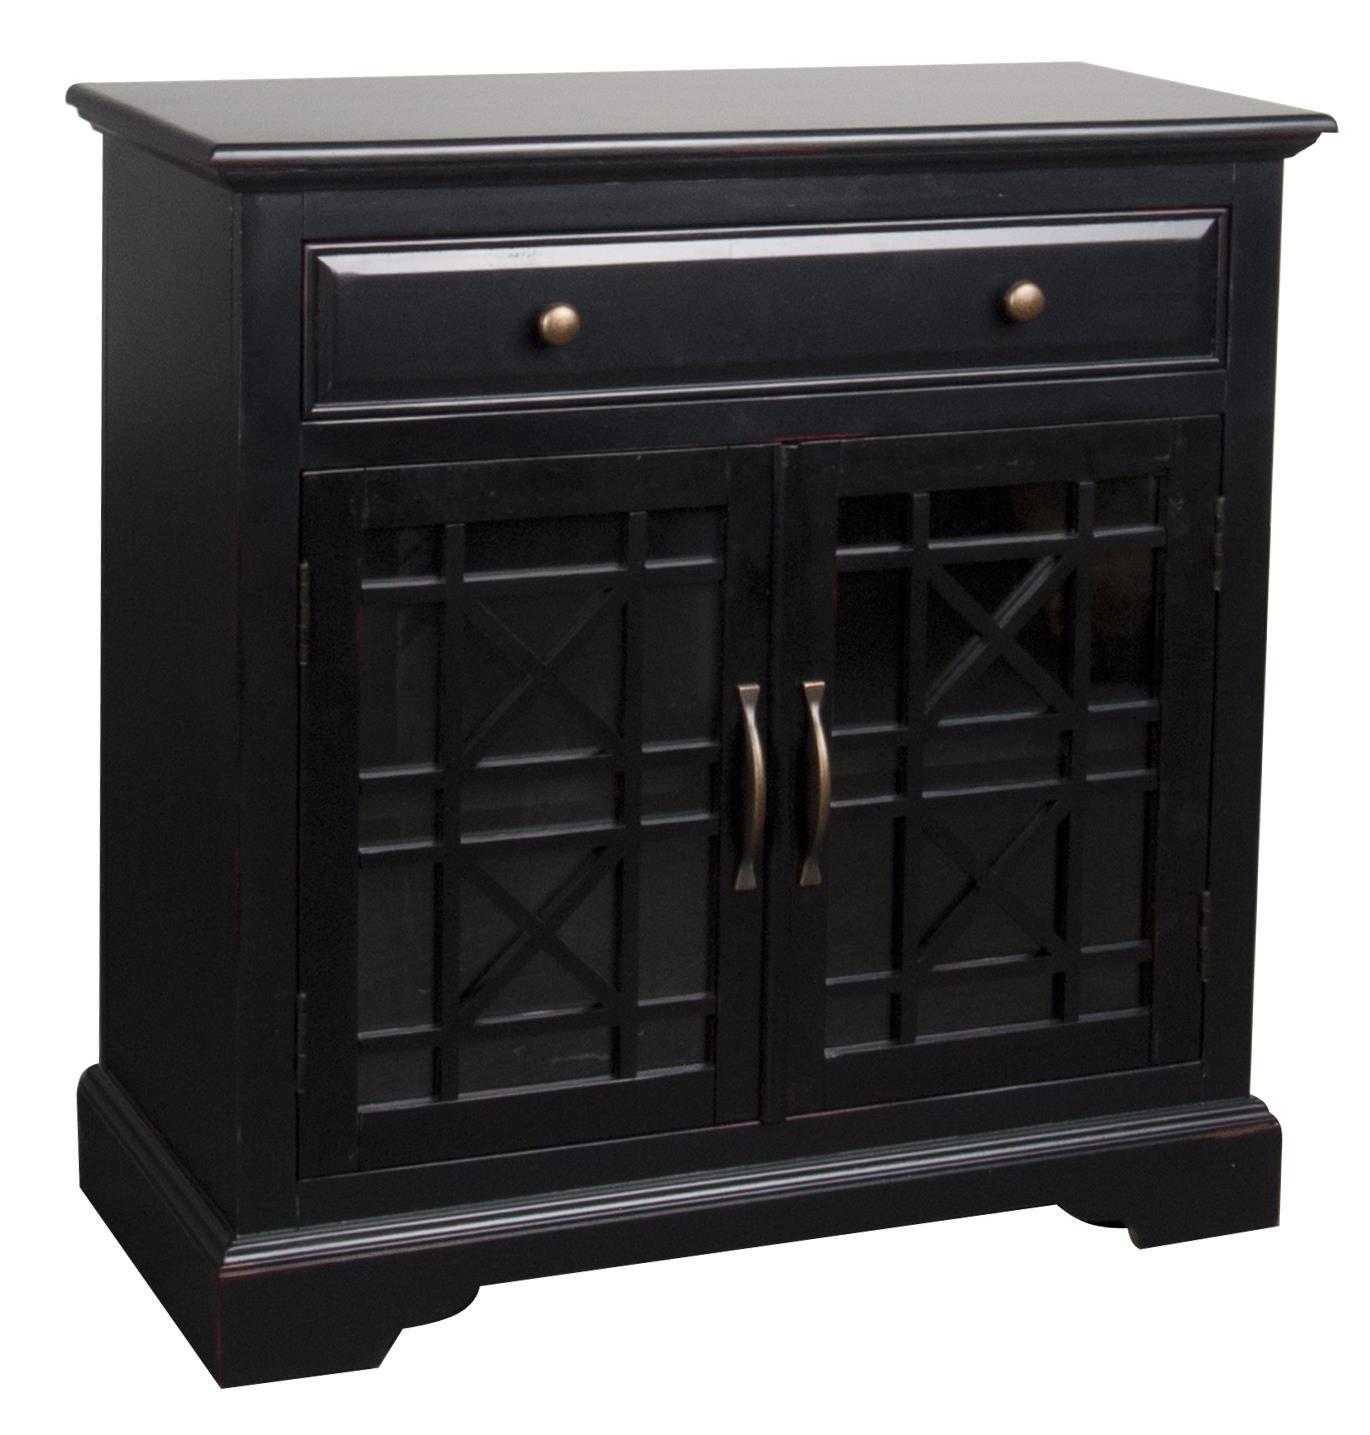 Morris Home Furnishings Limetree Limetree Cabinet - Item Number: 330955296